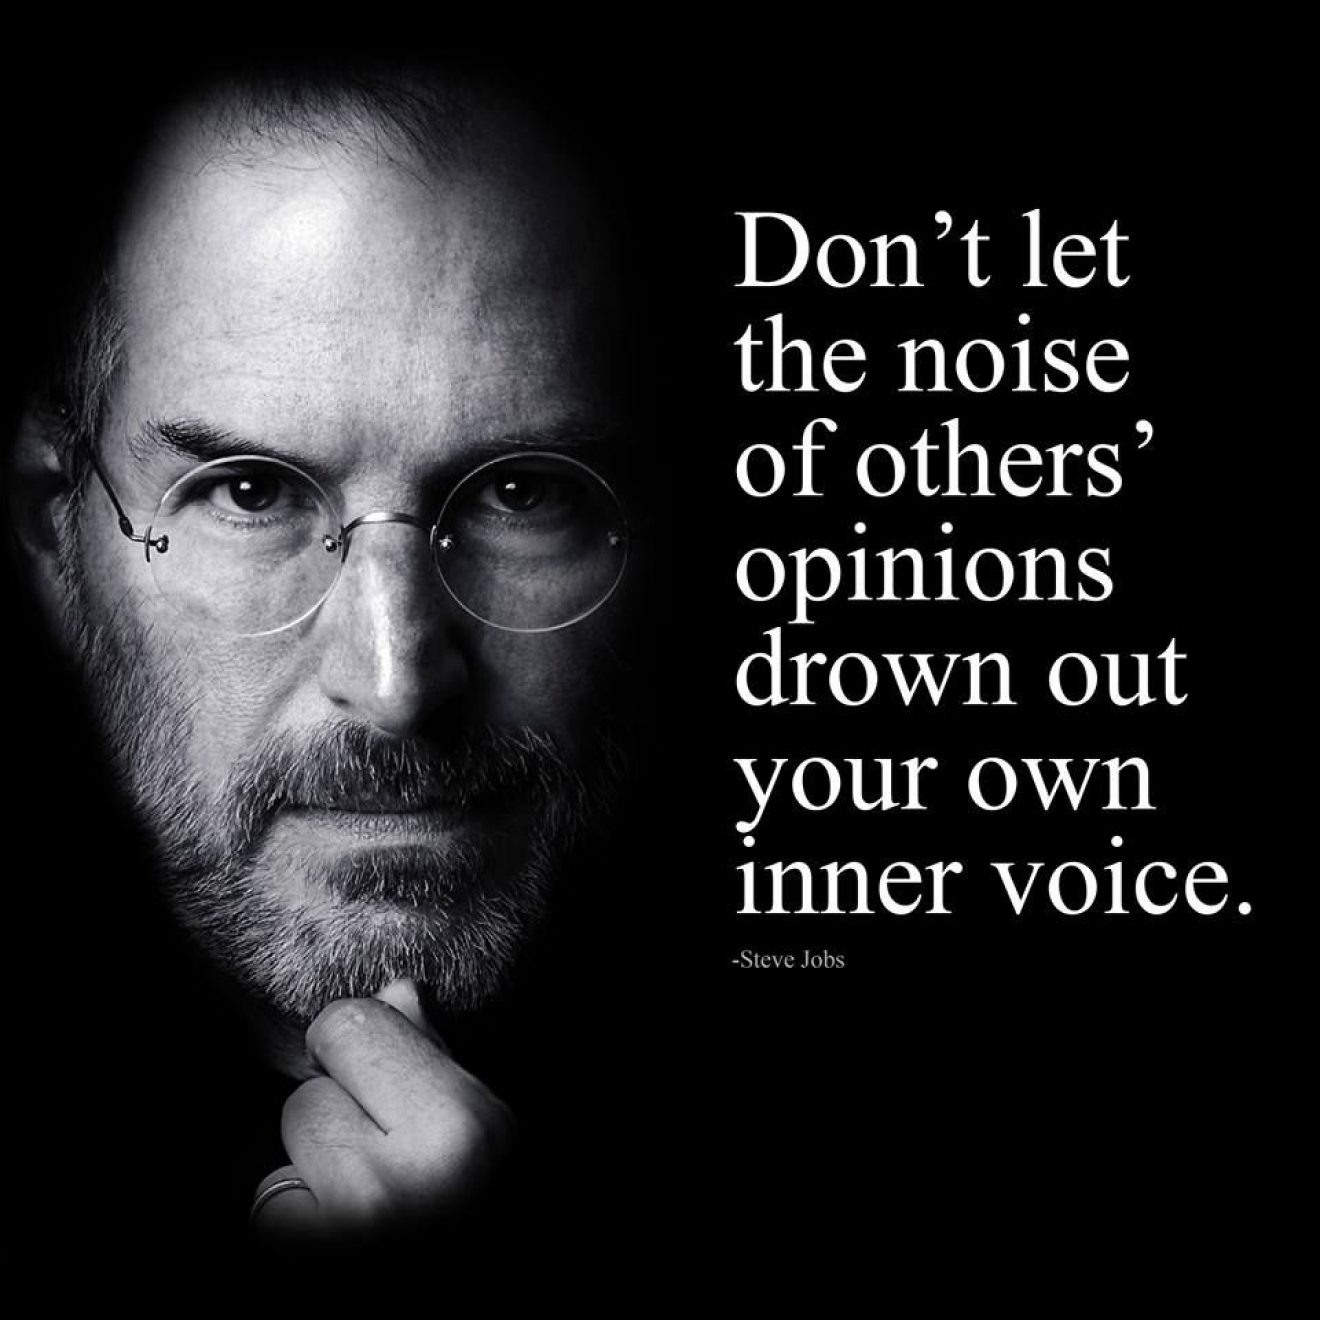 Steve Jobds advice